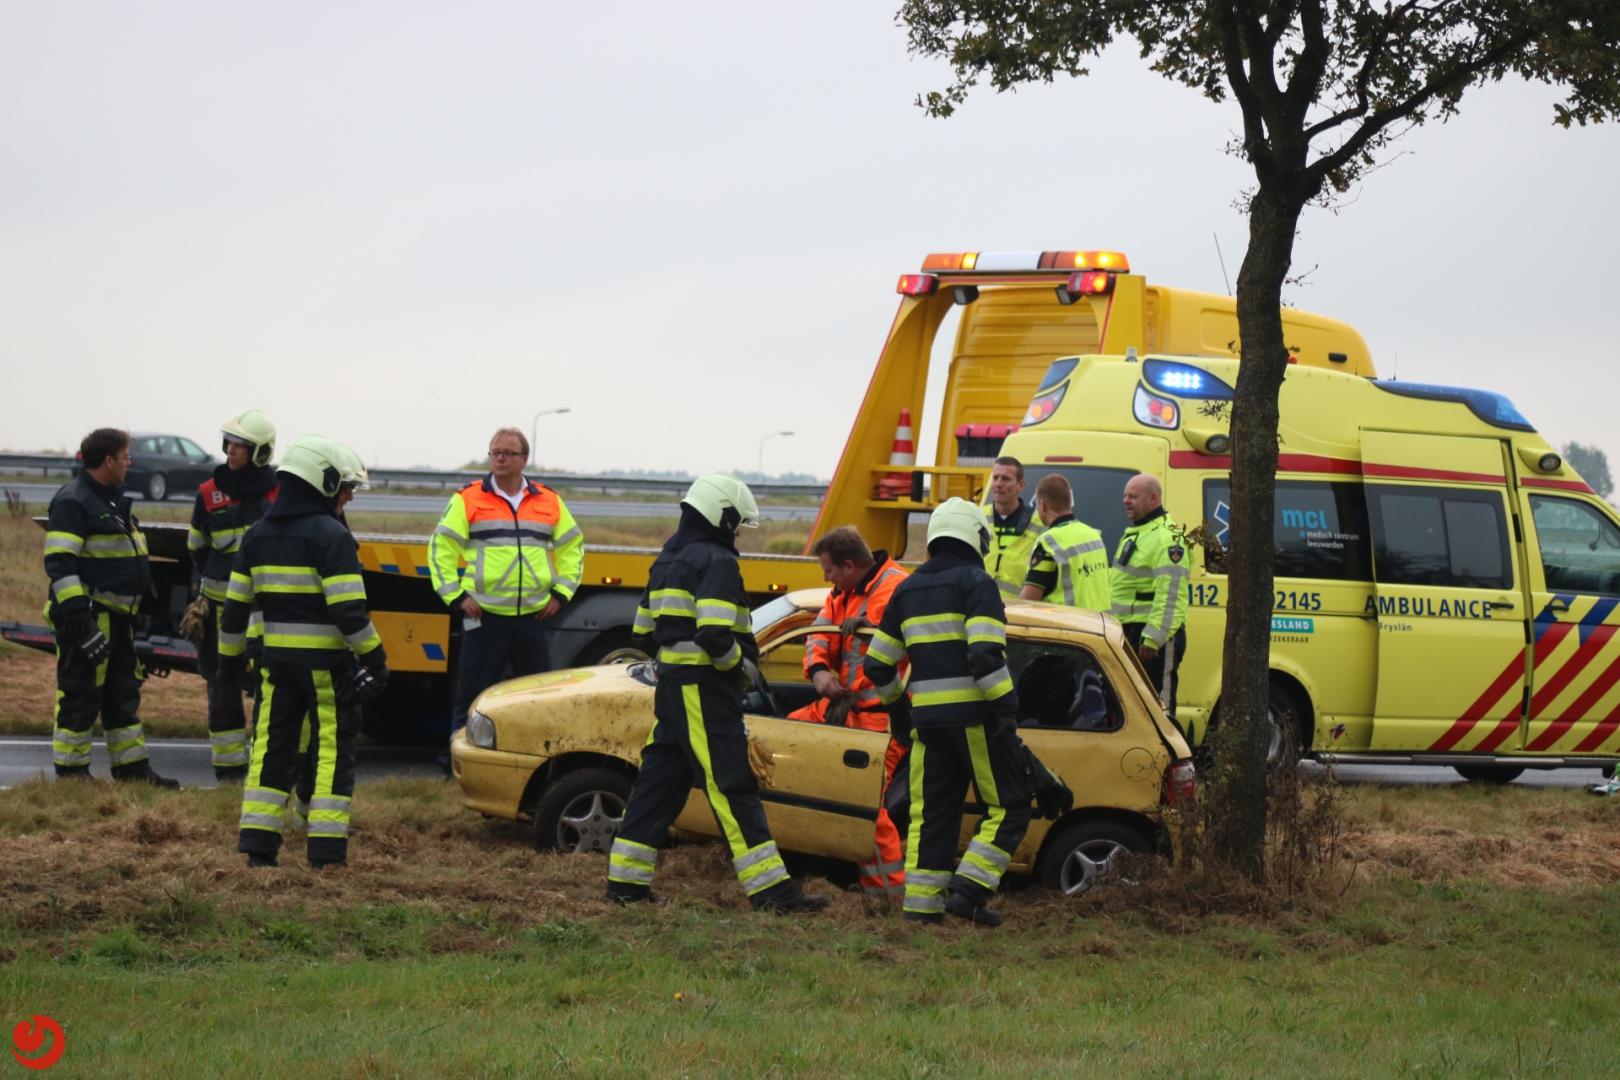 Vrouw en kind ongedeerd na ongeval